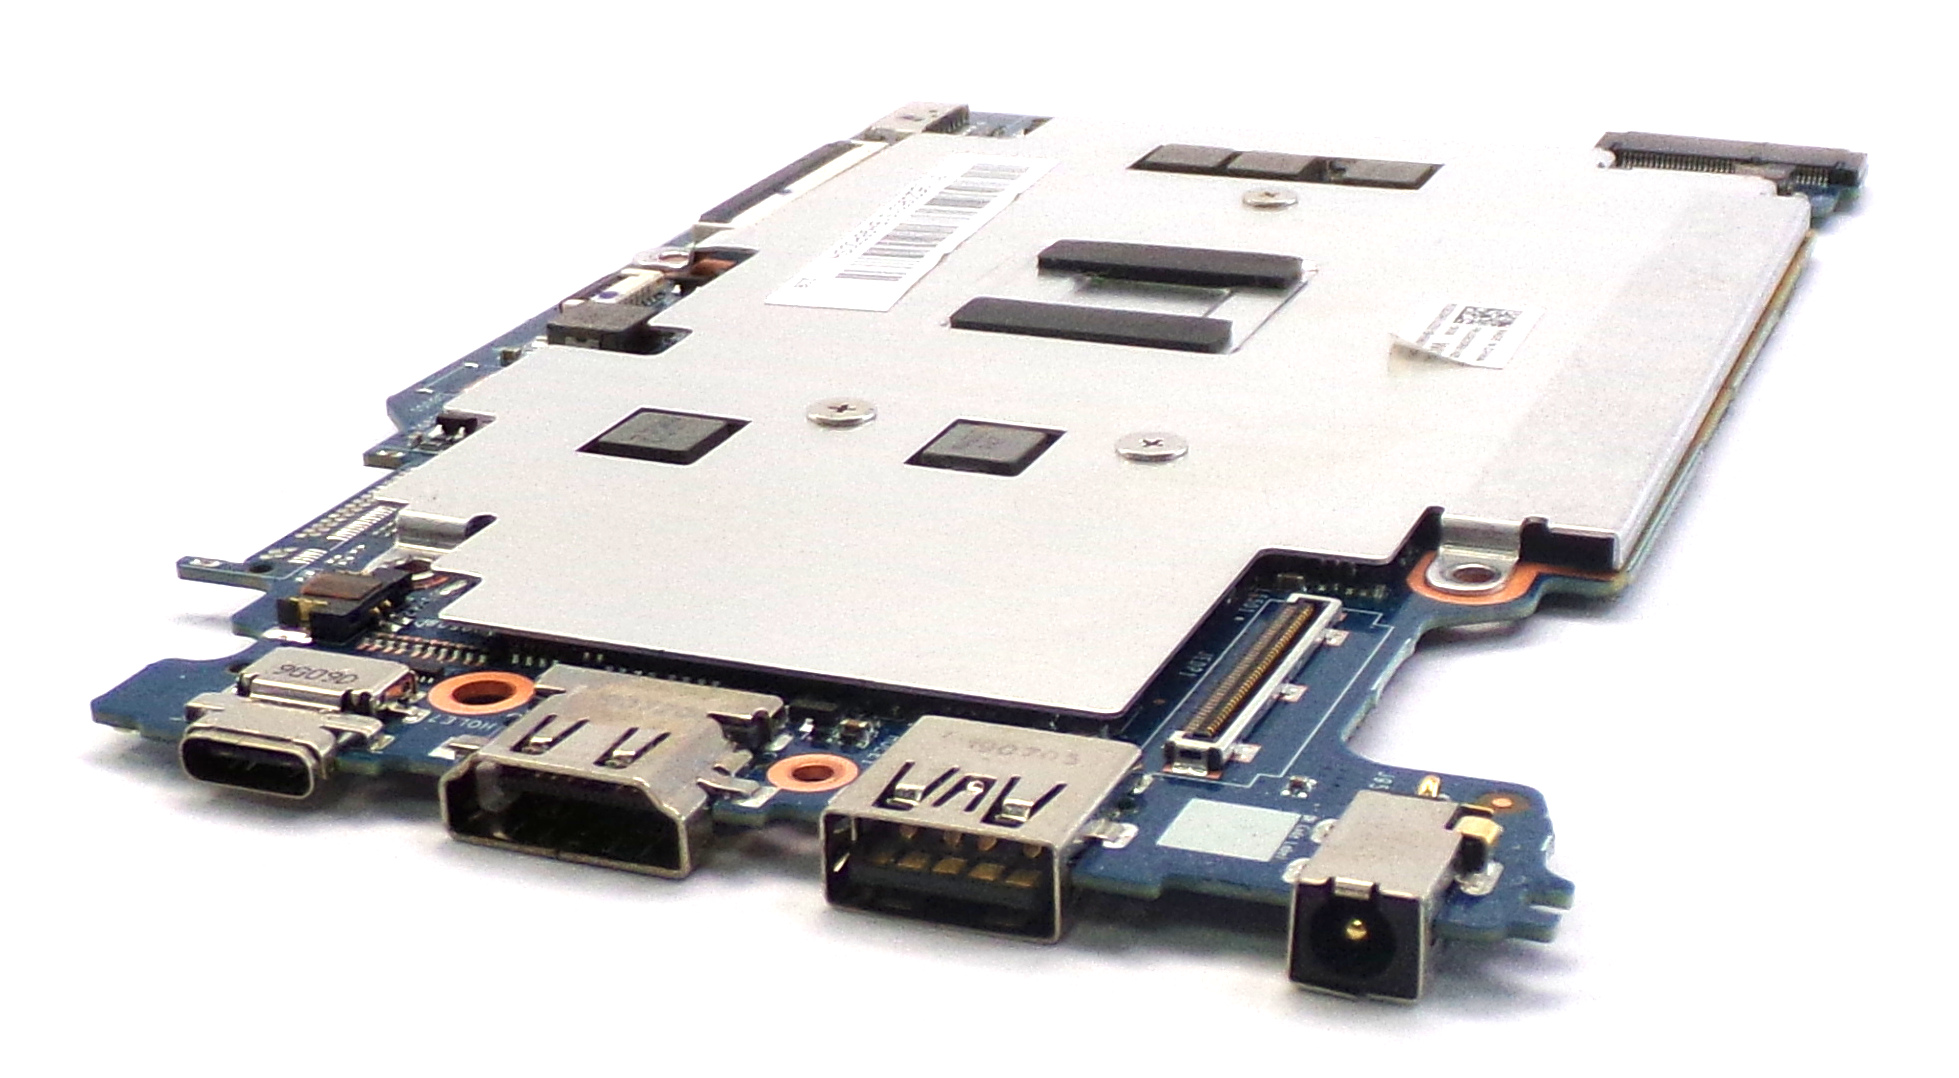 5B20R61425 Lenovo Ideapad S130-11IGM Celeron N4000 4GB 64GB Motherboard